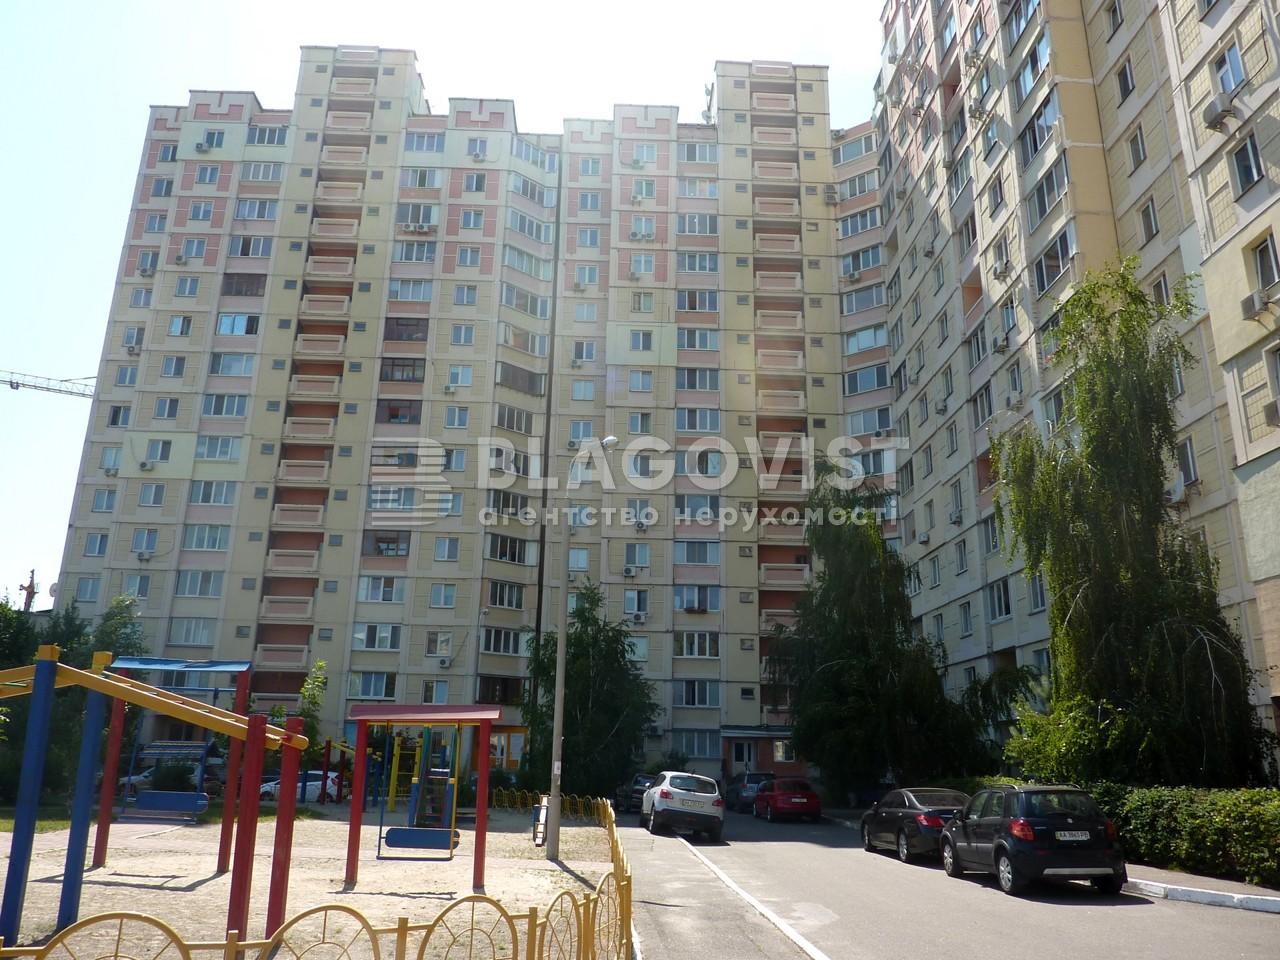 Квартира Z-233612, Ломоносова, 83а, Киев - Фото 3